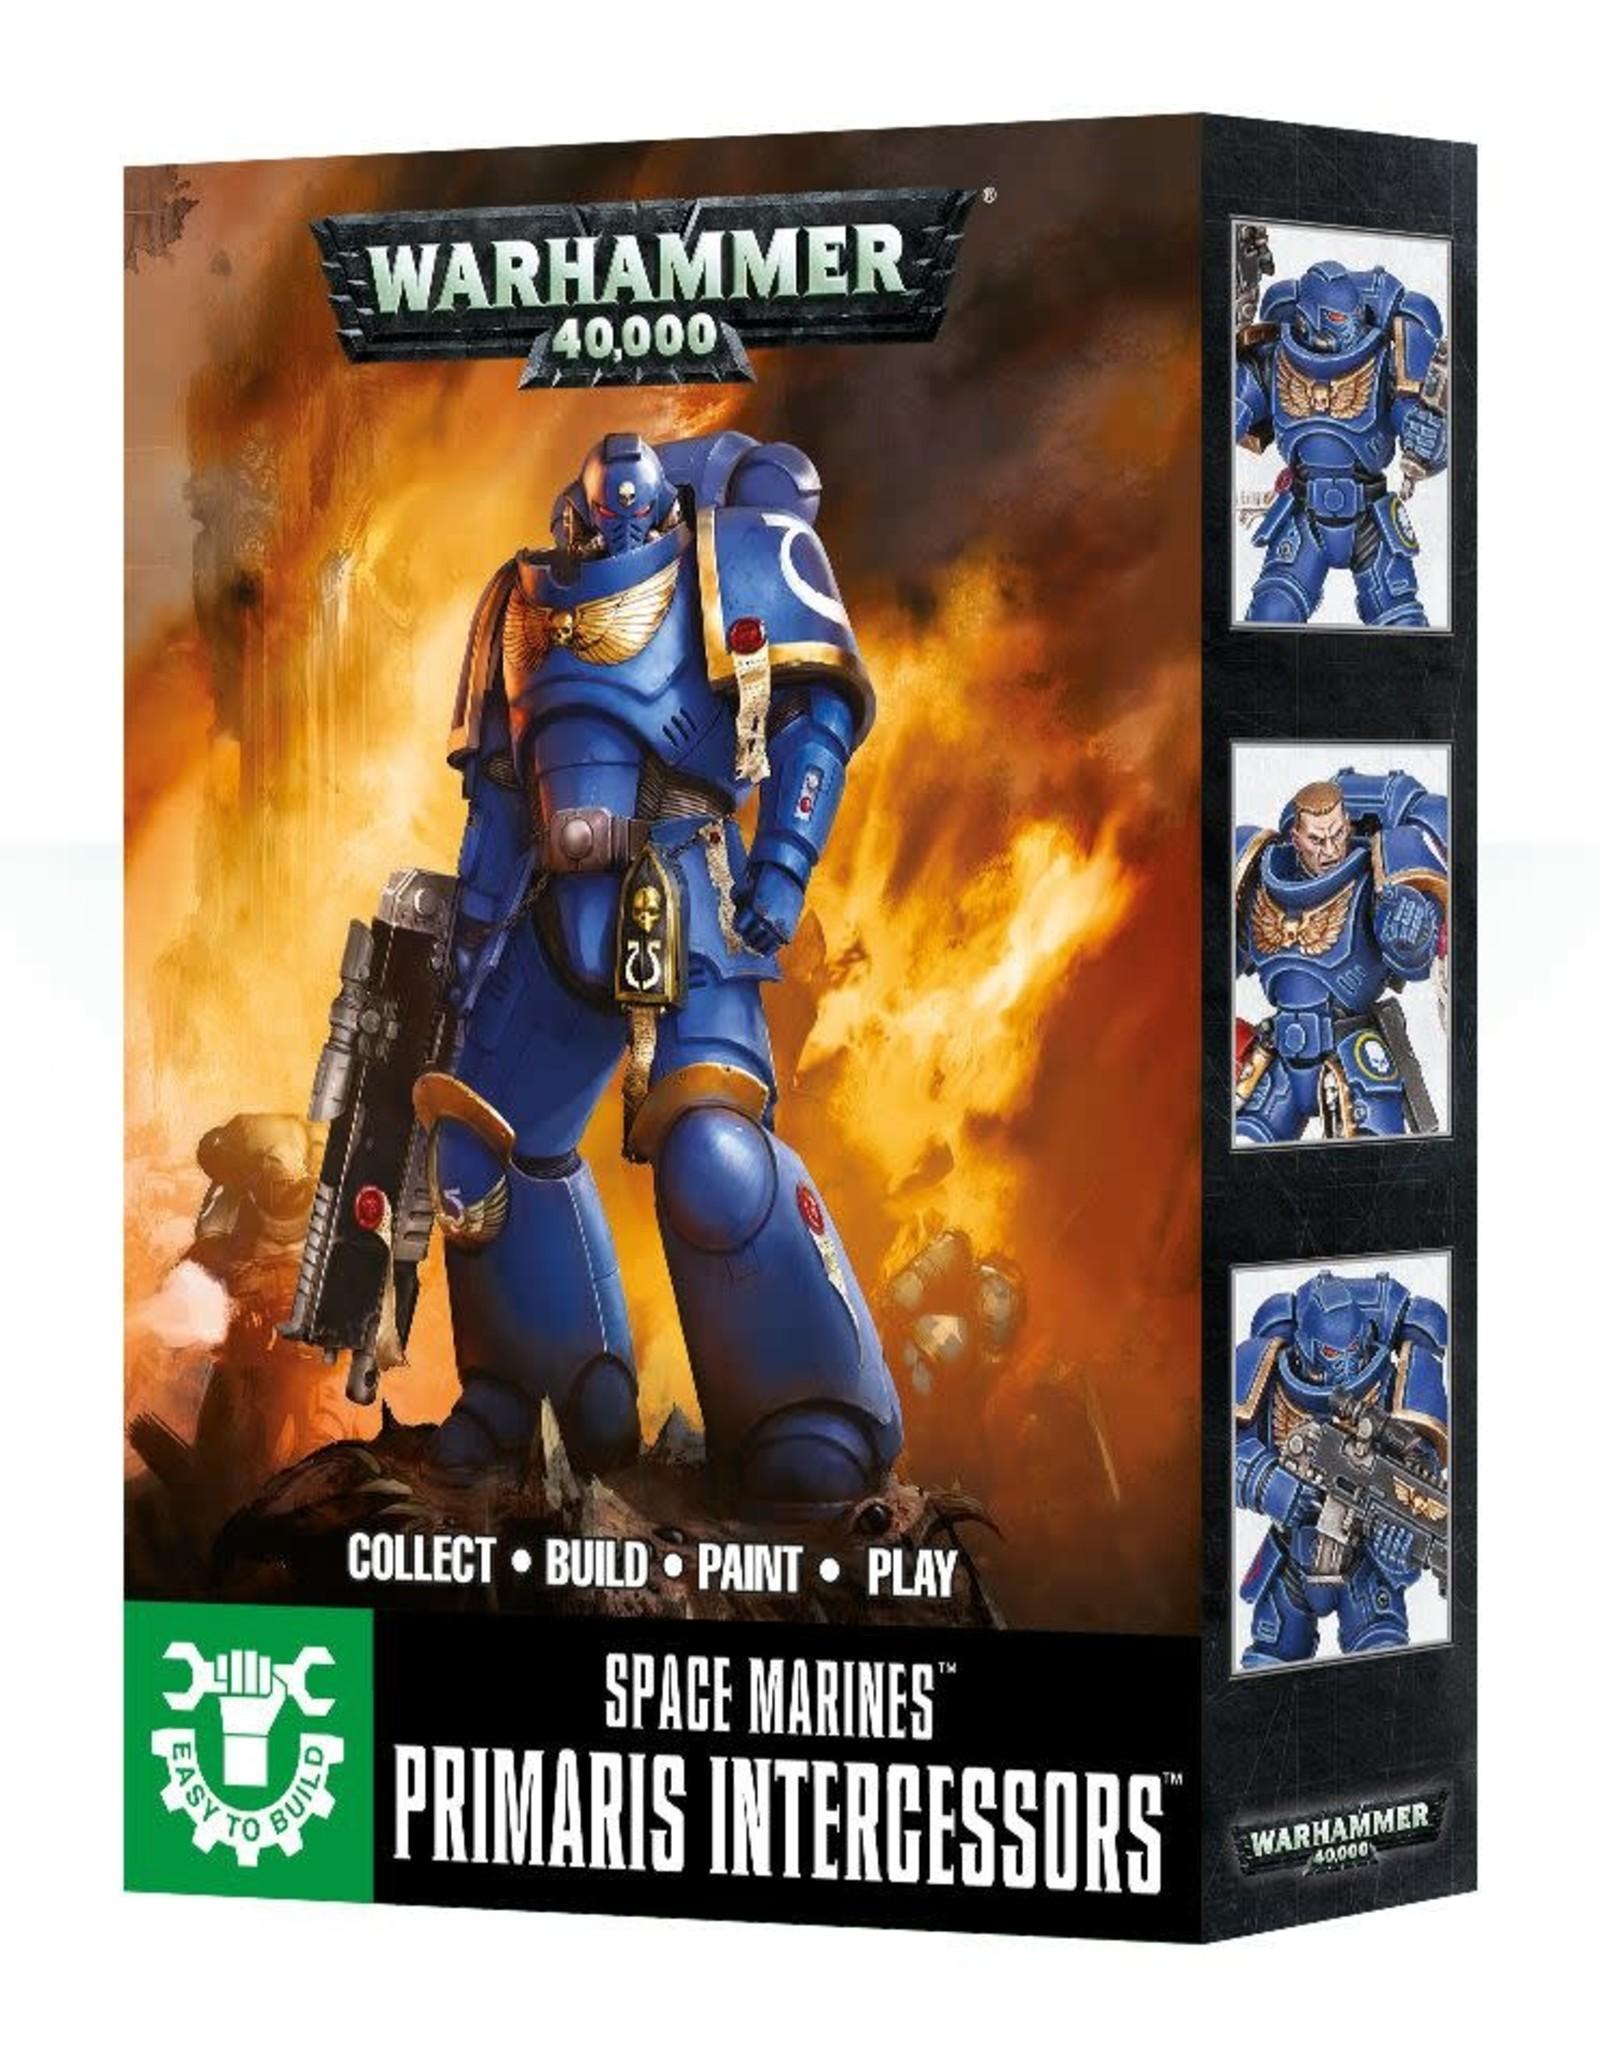 Warhammer 40K ETB: Space Marines Primaris Intercessor